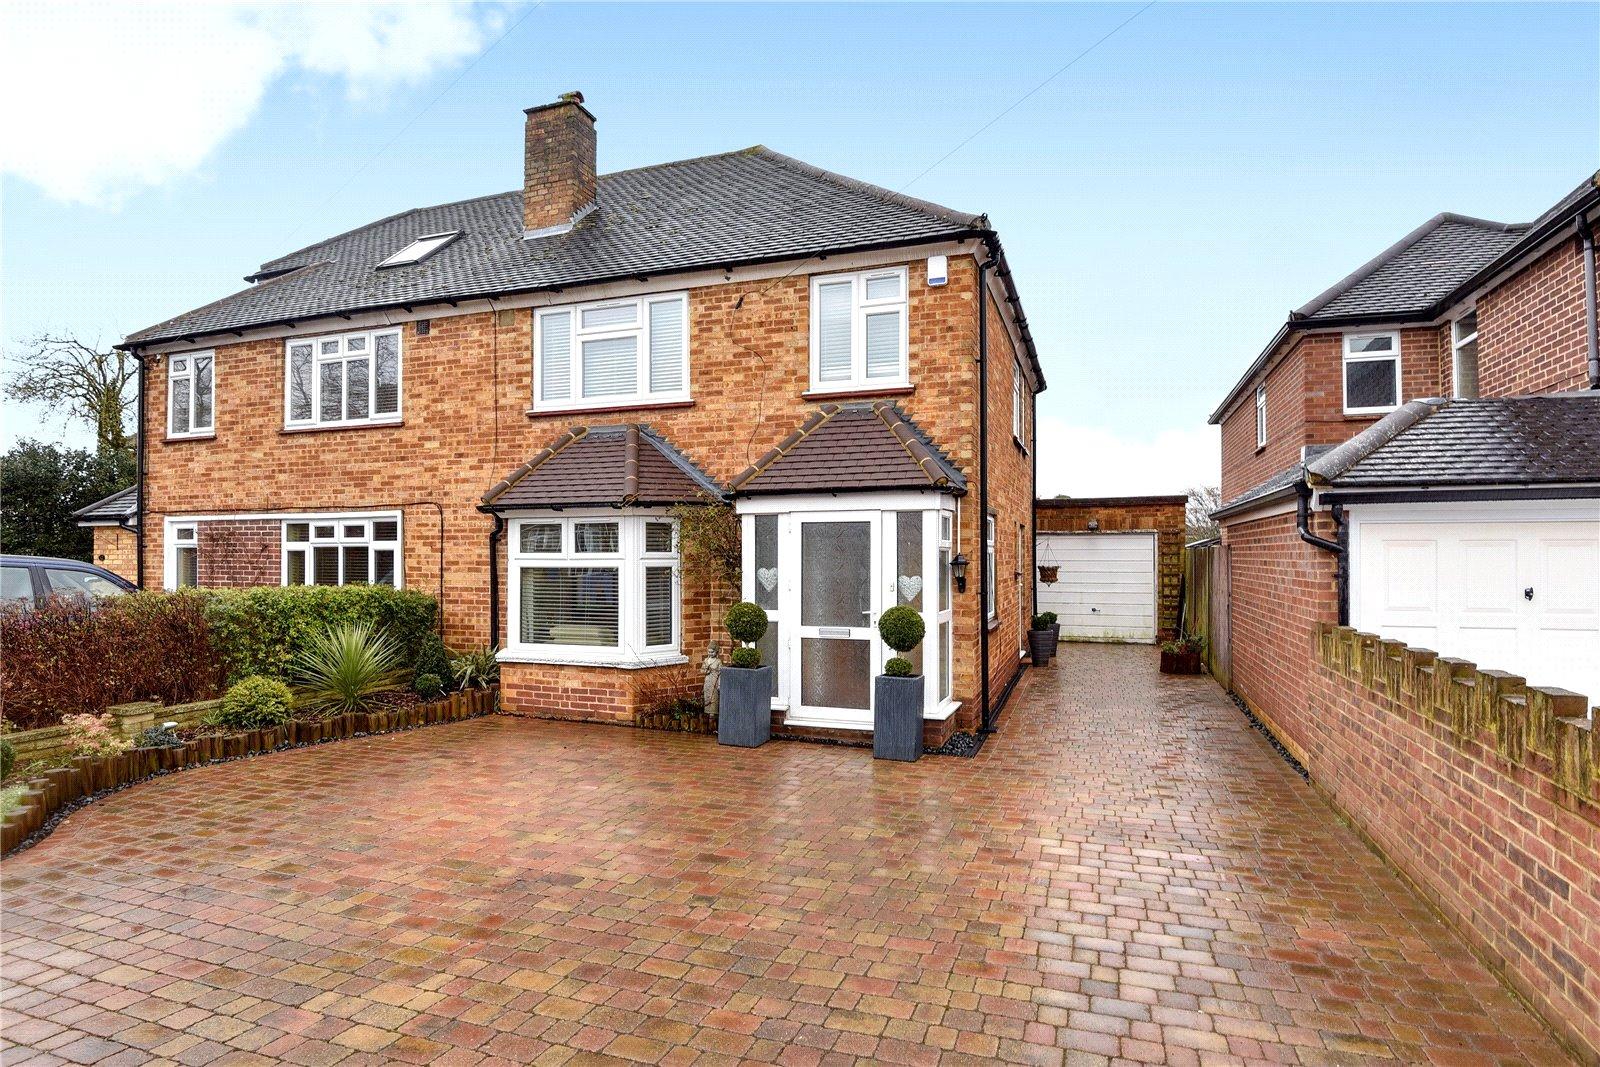 3 Bedrooms Semi Detached House for sale in Headington Road, Maidenhead, Berkshire, SL6